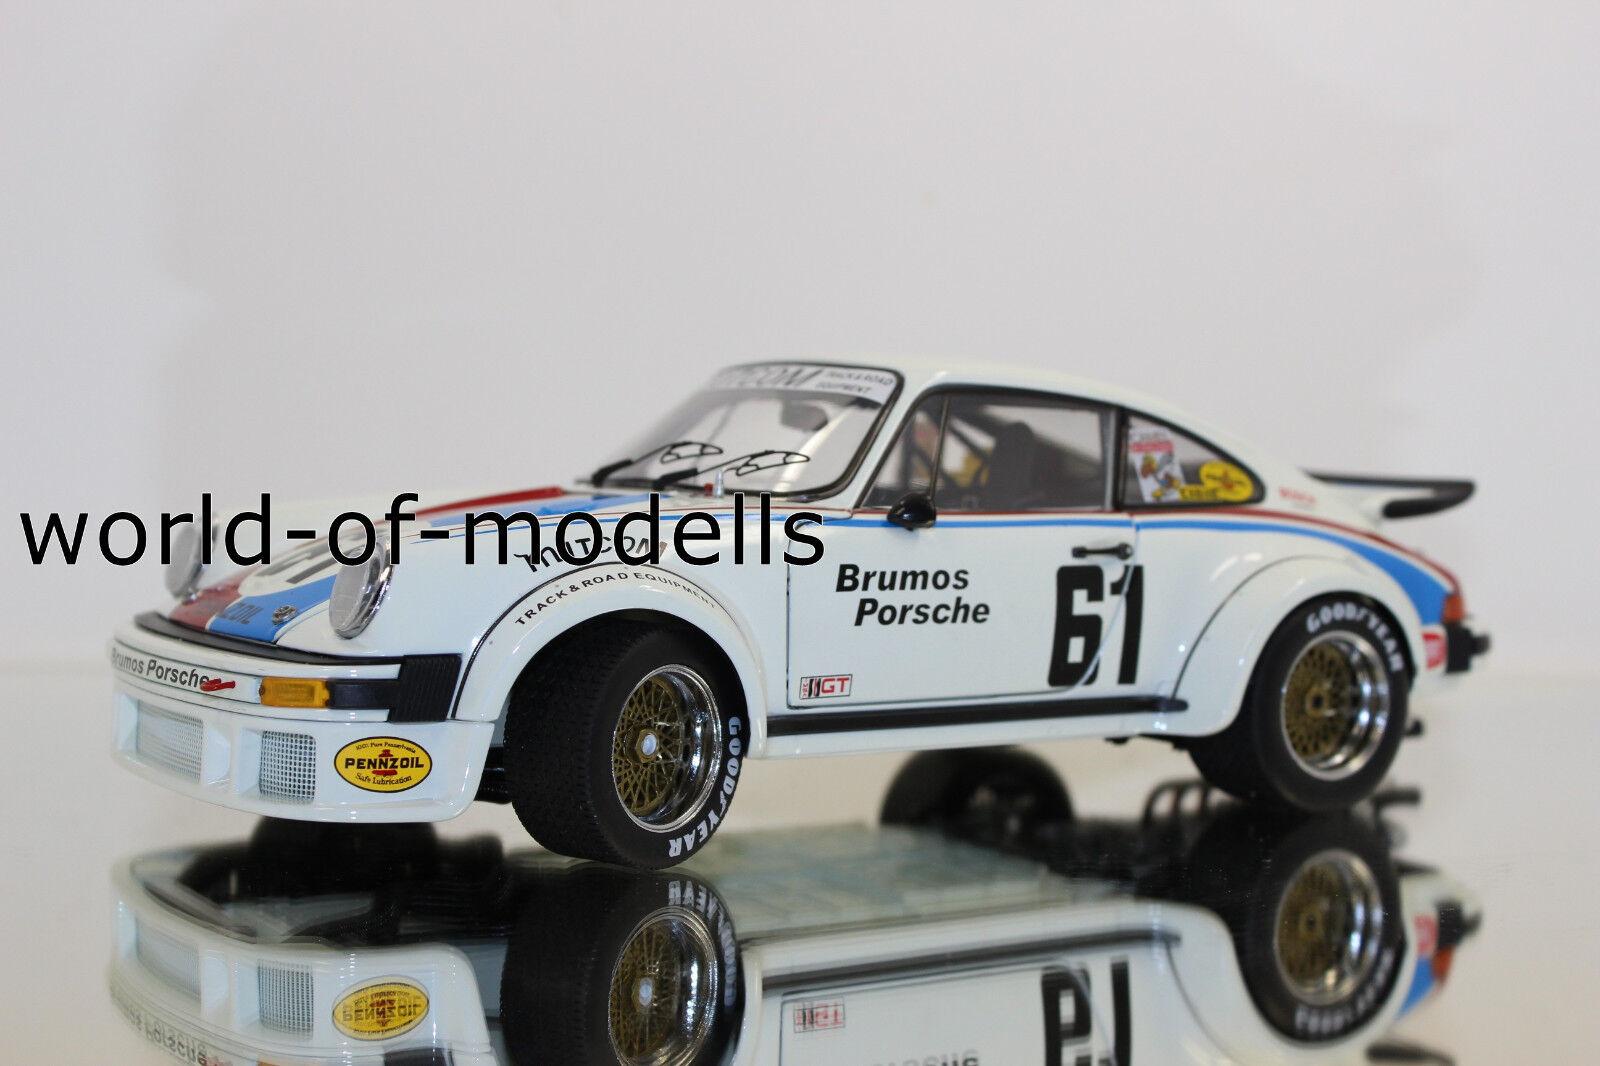 Schuco 450033800 Porsche 934 Rsr Brumos 1:18 NUOVO CON conf. orig.